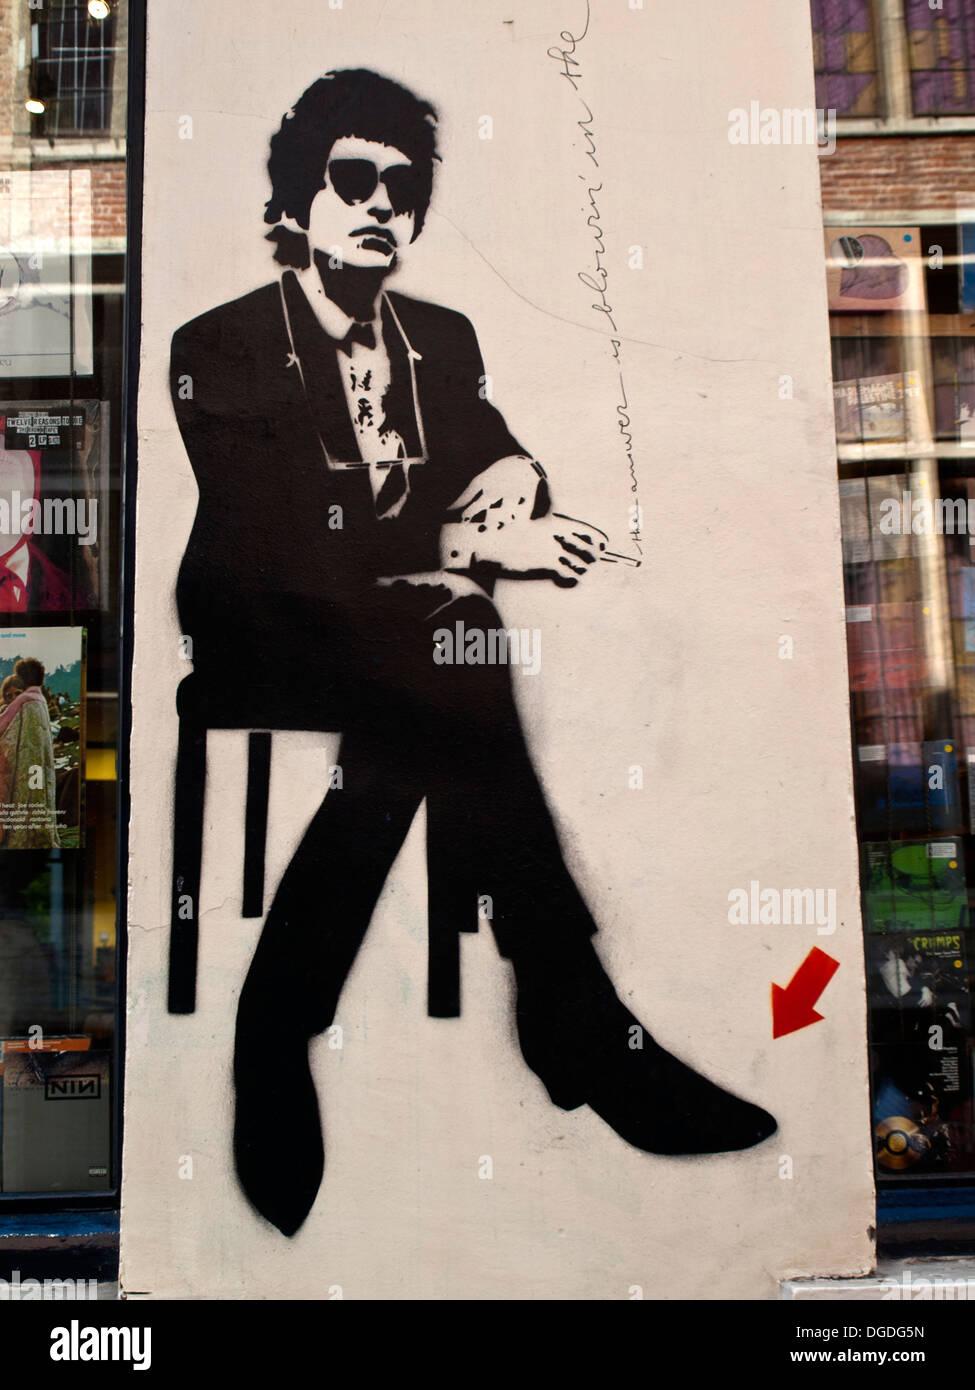 Musician wall graffiti in black - Stock Image